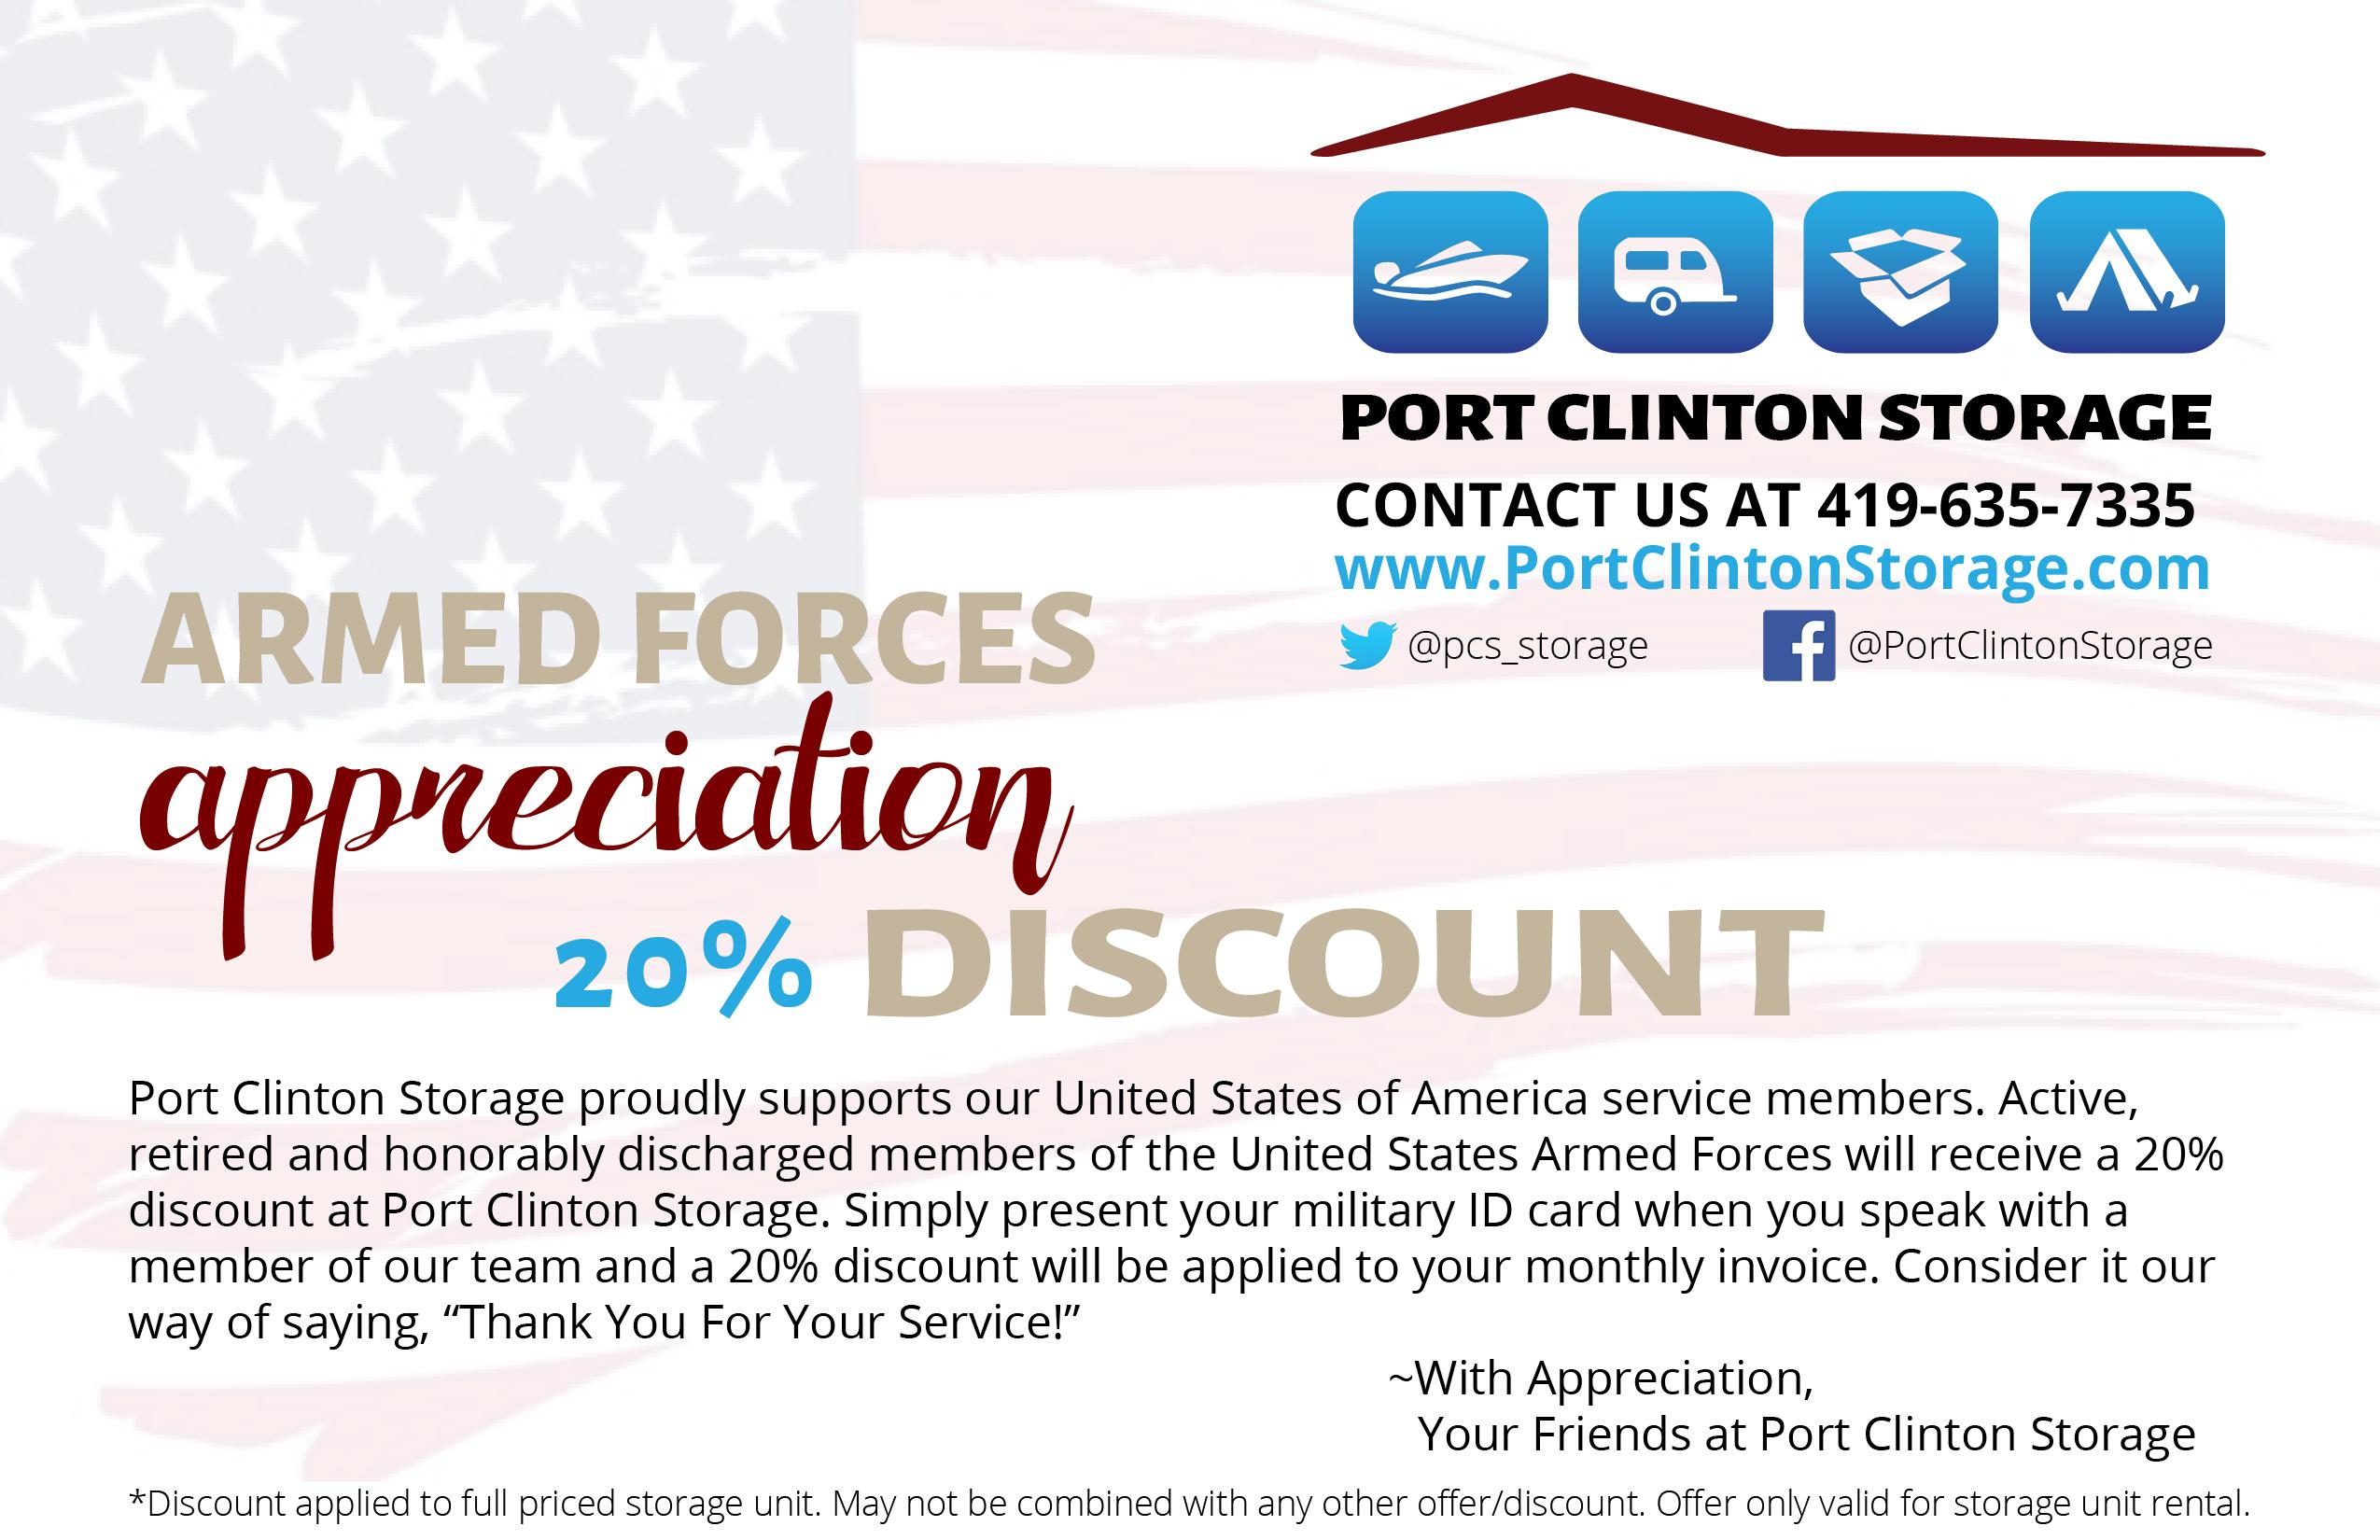 Armed Forces Appreciation Discount